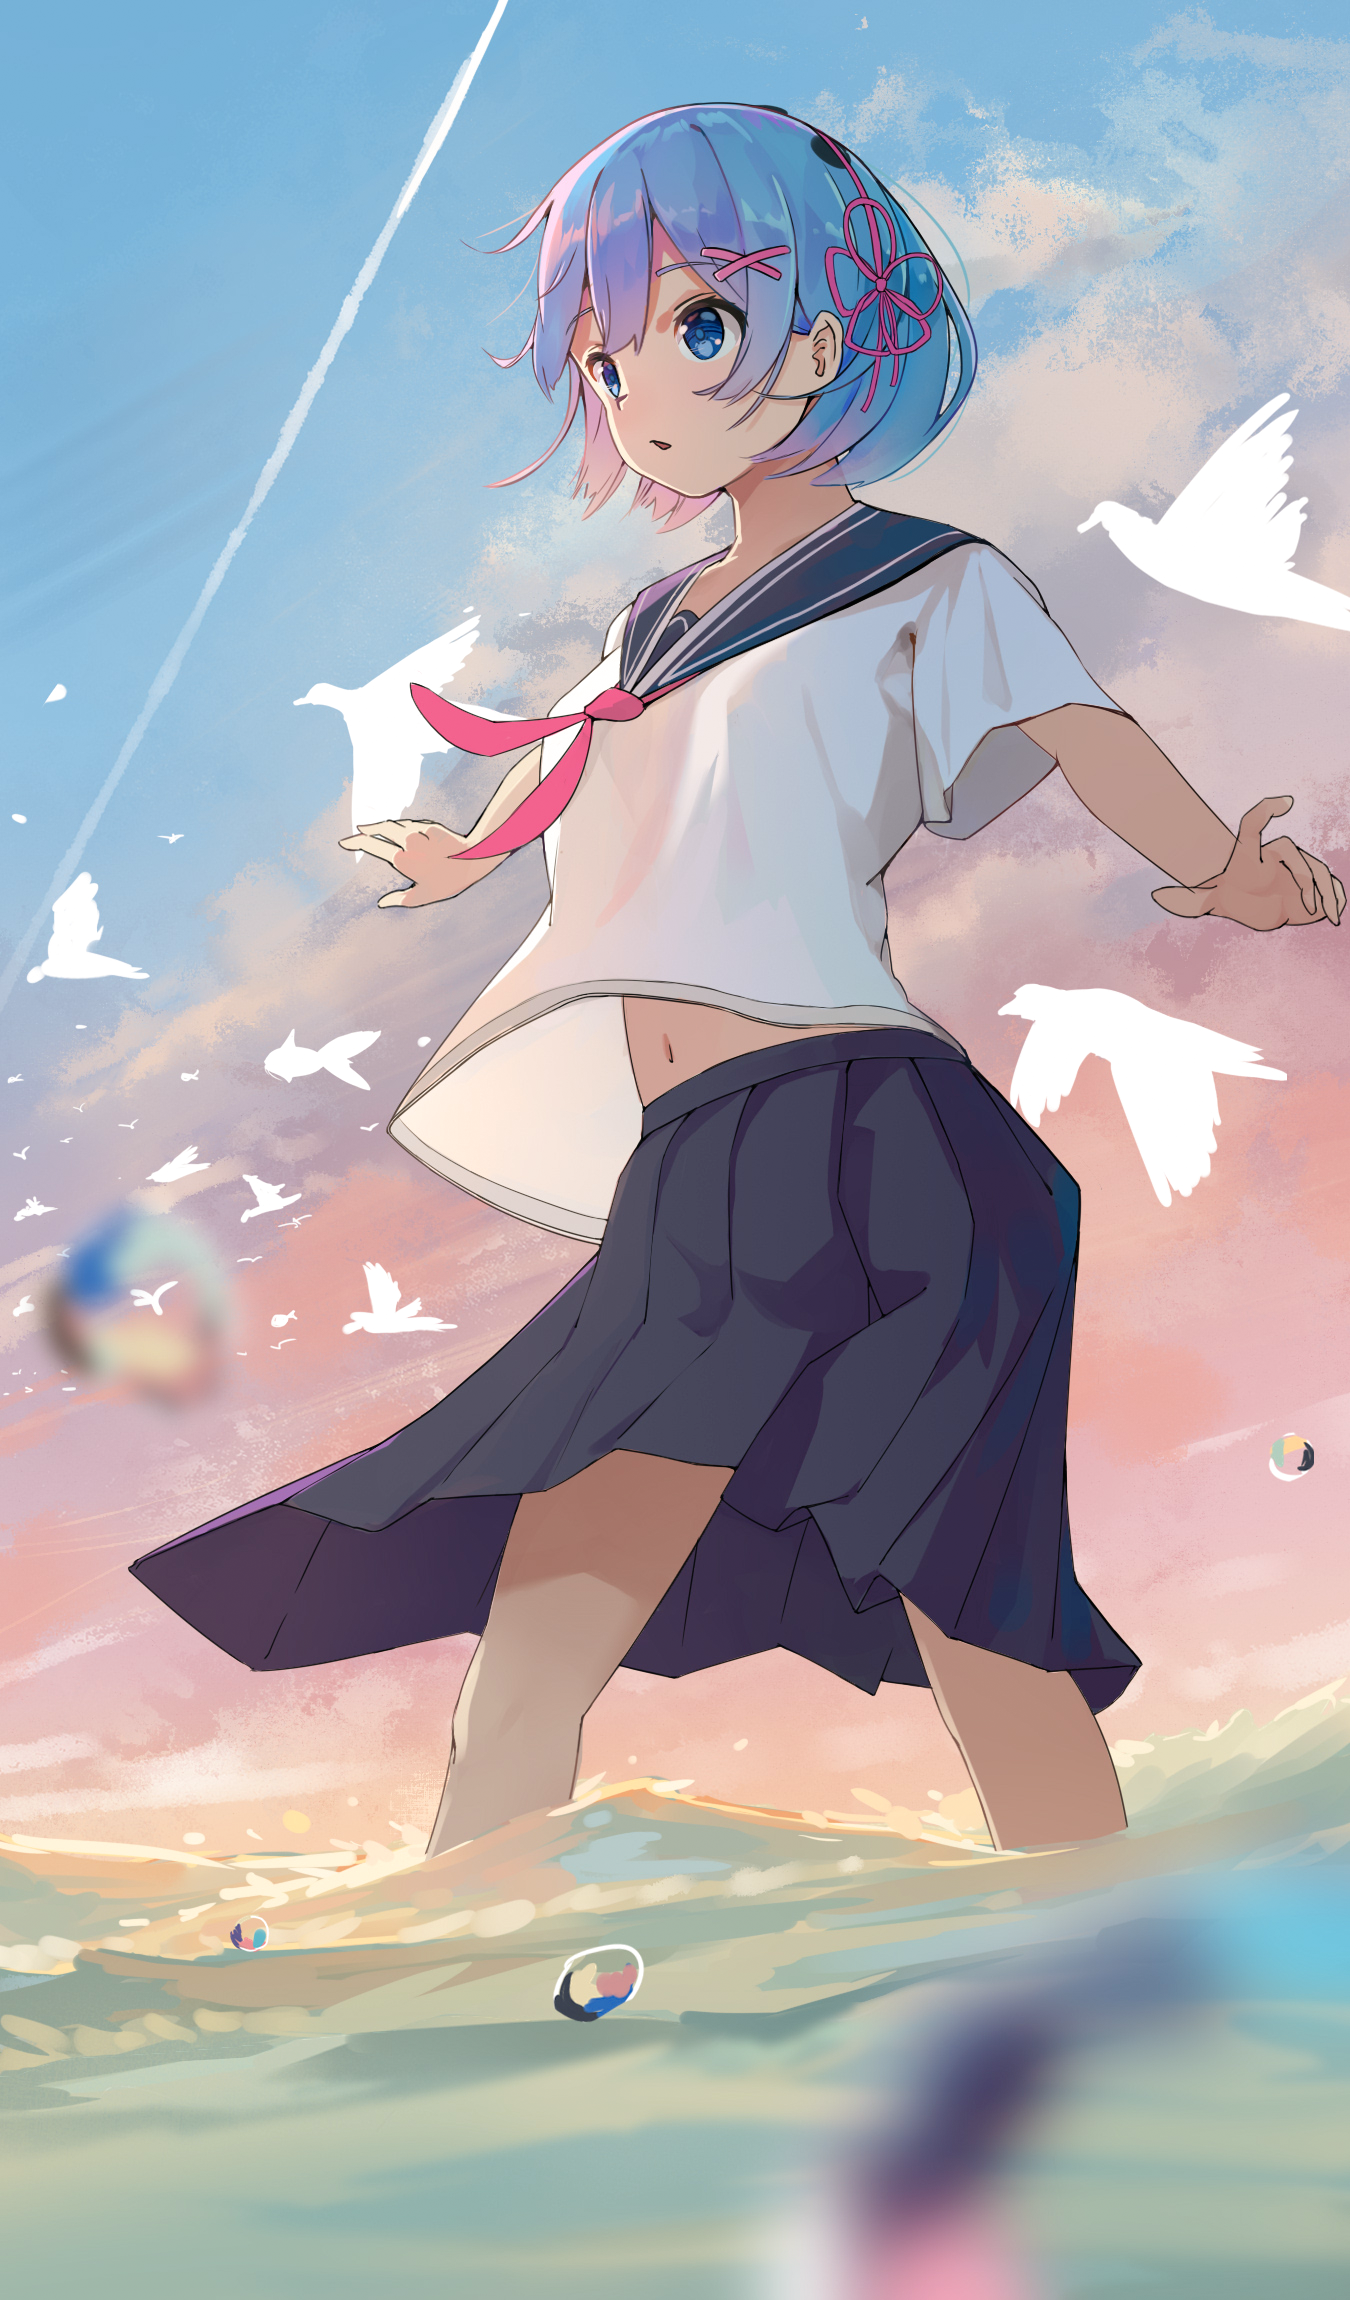 Anime 1350x2300 Re:Zero Kara Hajimeru Isekai Seikatsu anime girls short hair blue hair school uniform fan art blue eyes Rem (Re: Zero) sea vertical